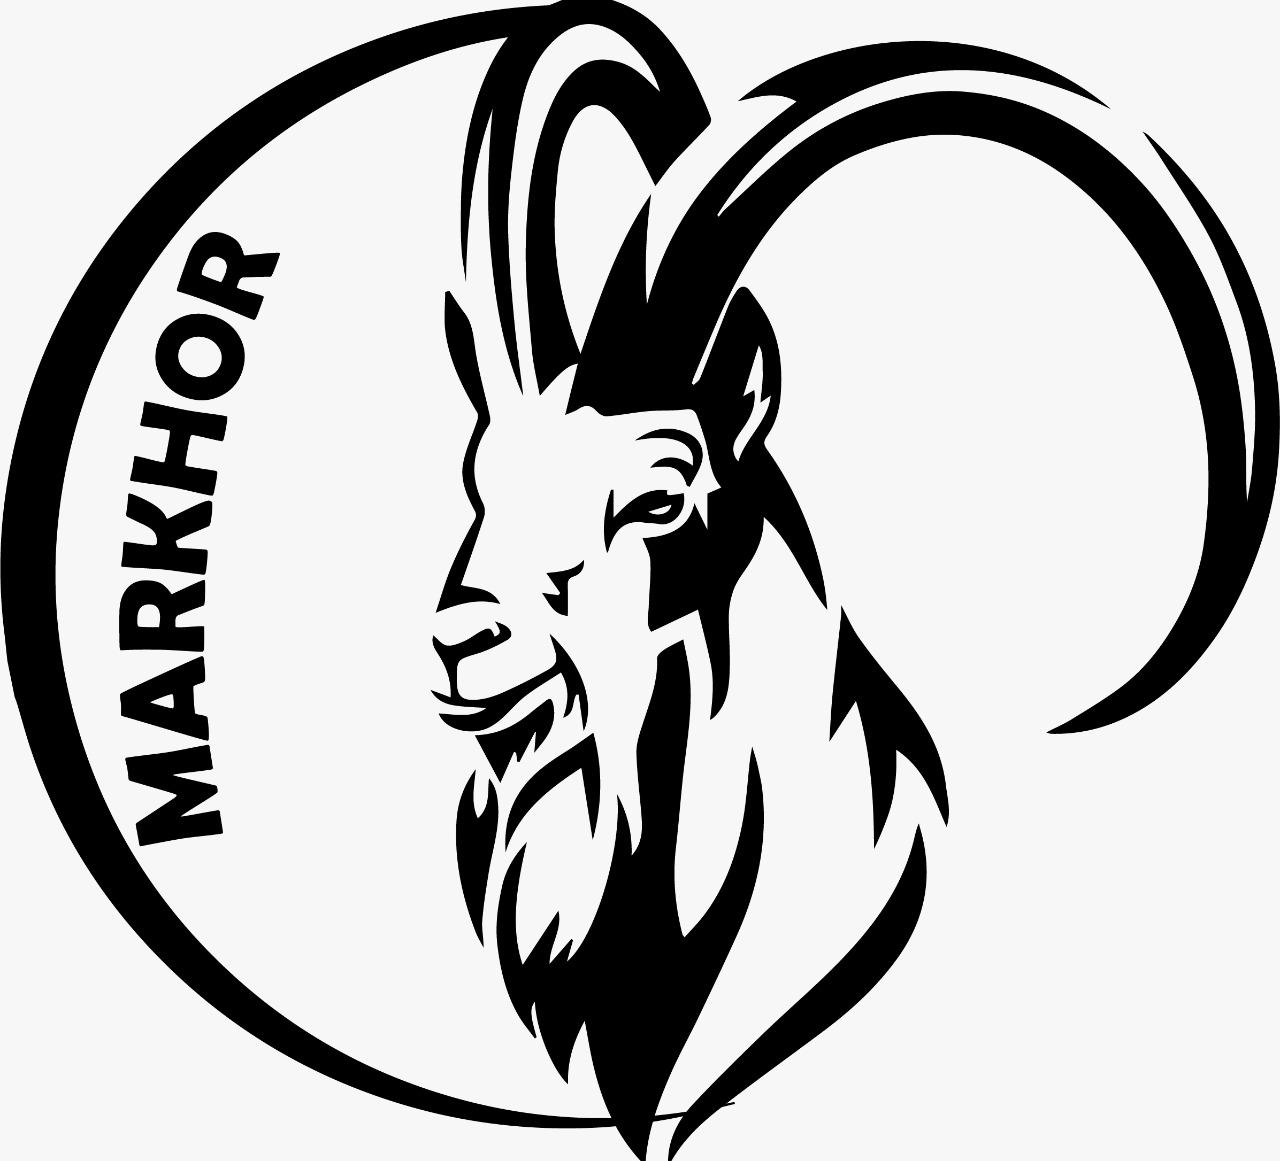 MARKHOR EXPORTERS CO. LTD.